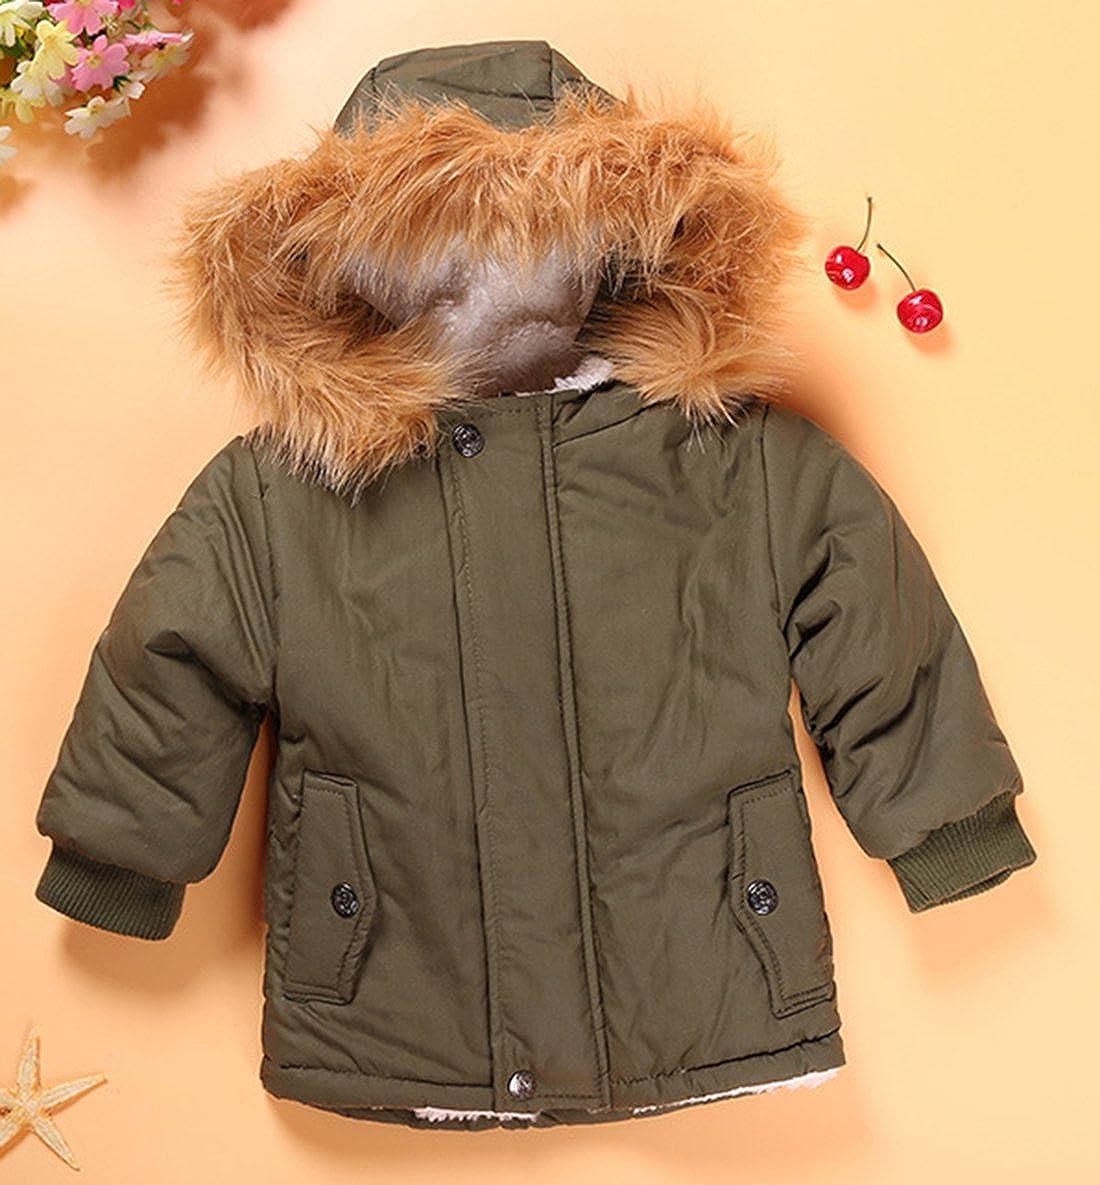 FAYALE Toddler Baby Boy Winter Warm Jacket Gown Kids Hoodie Outwears Coat